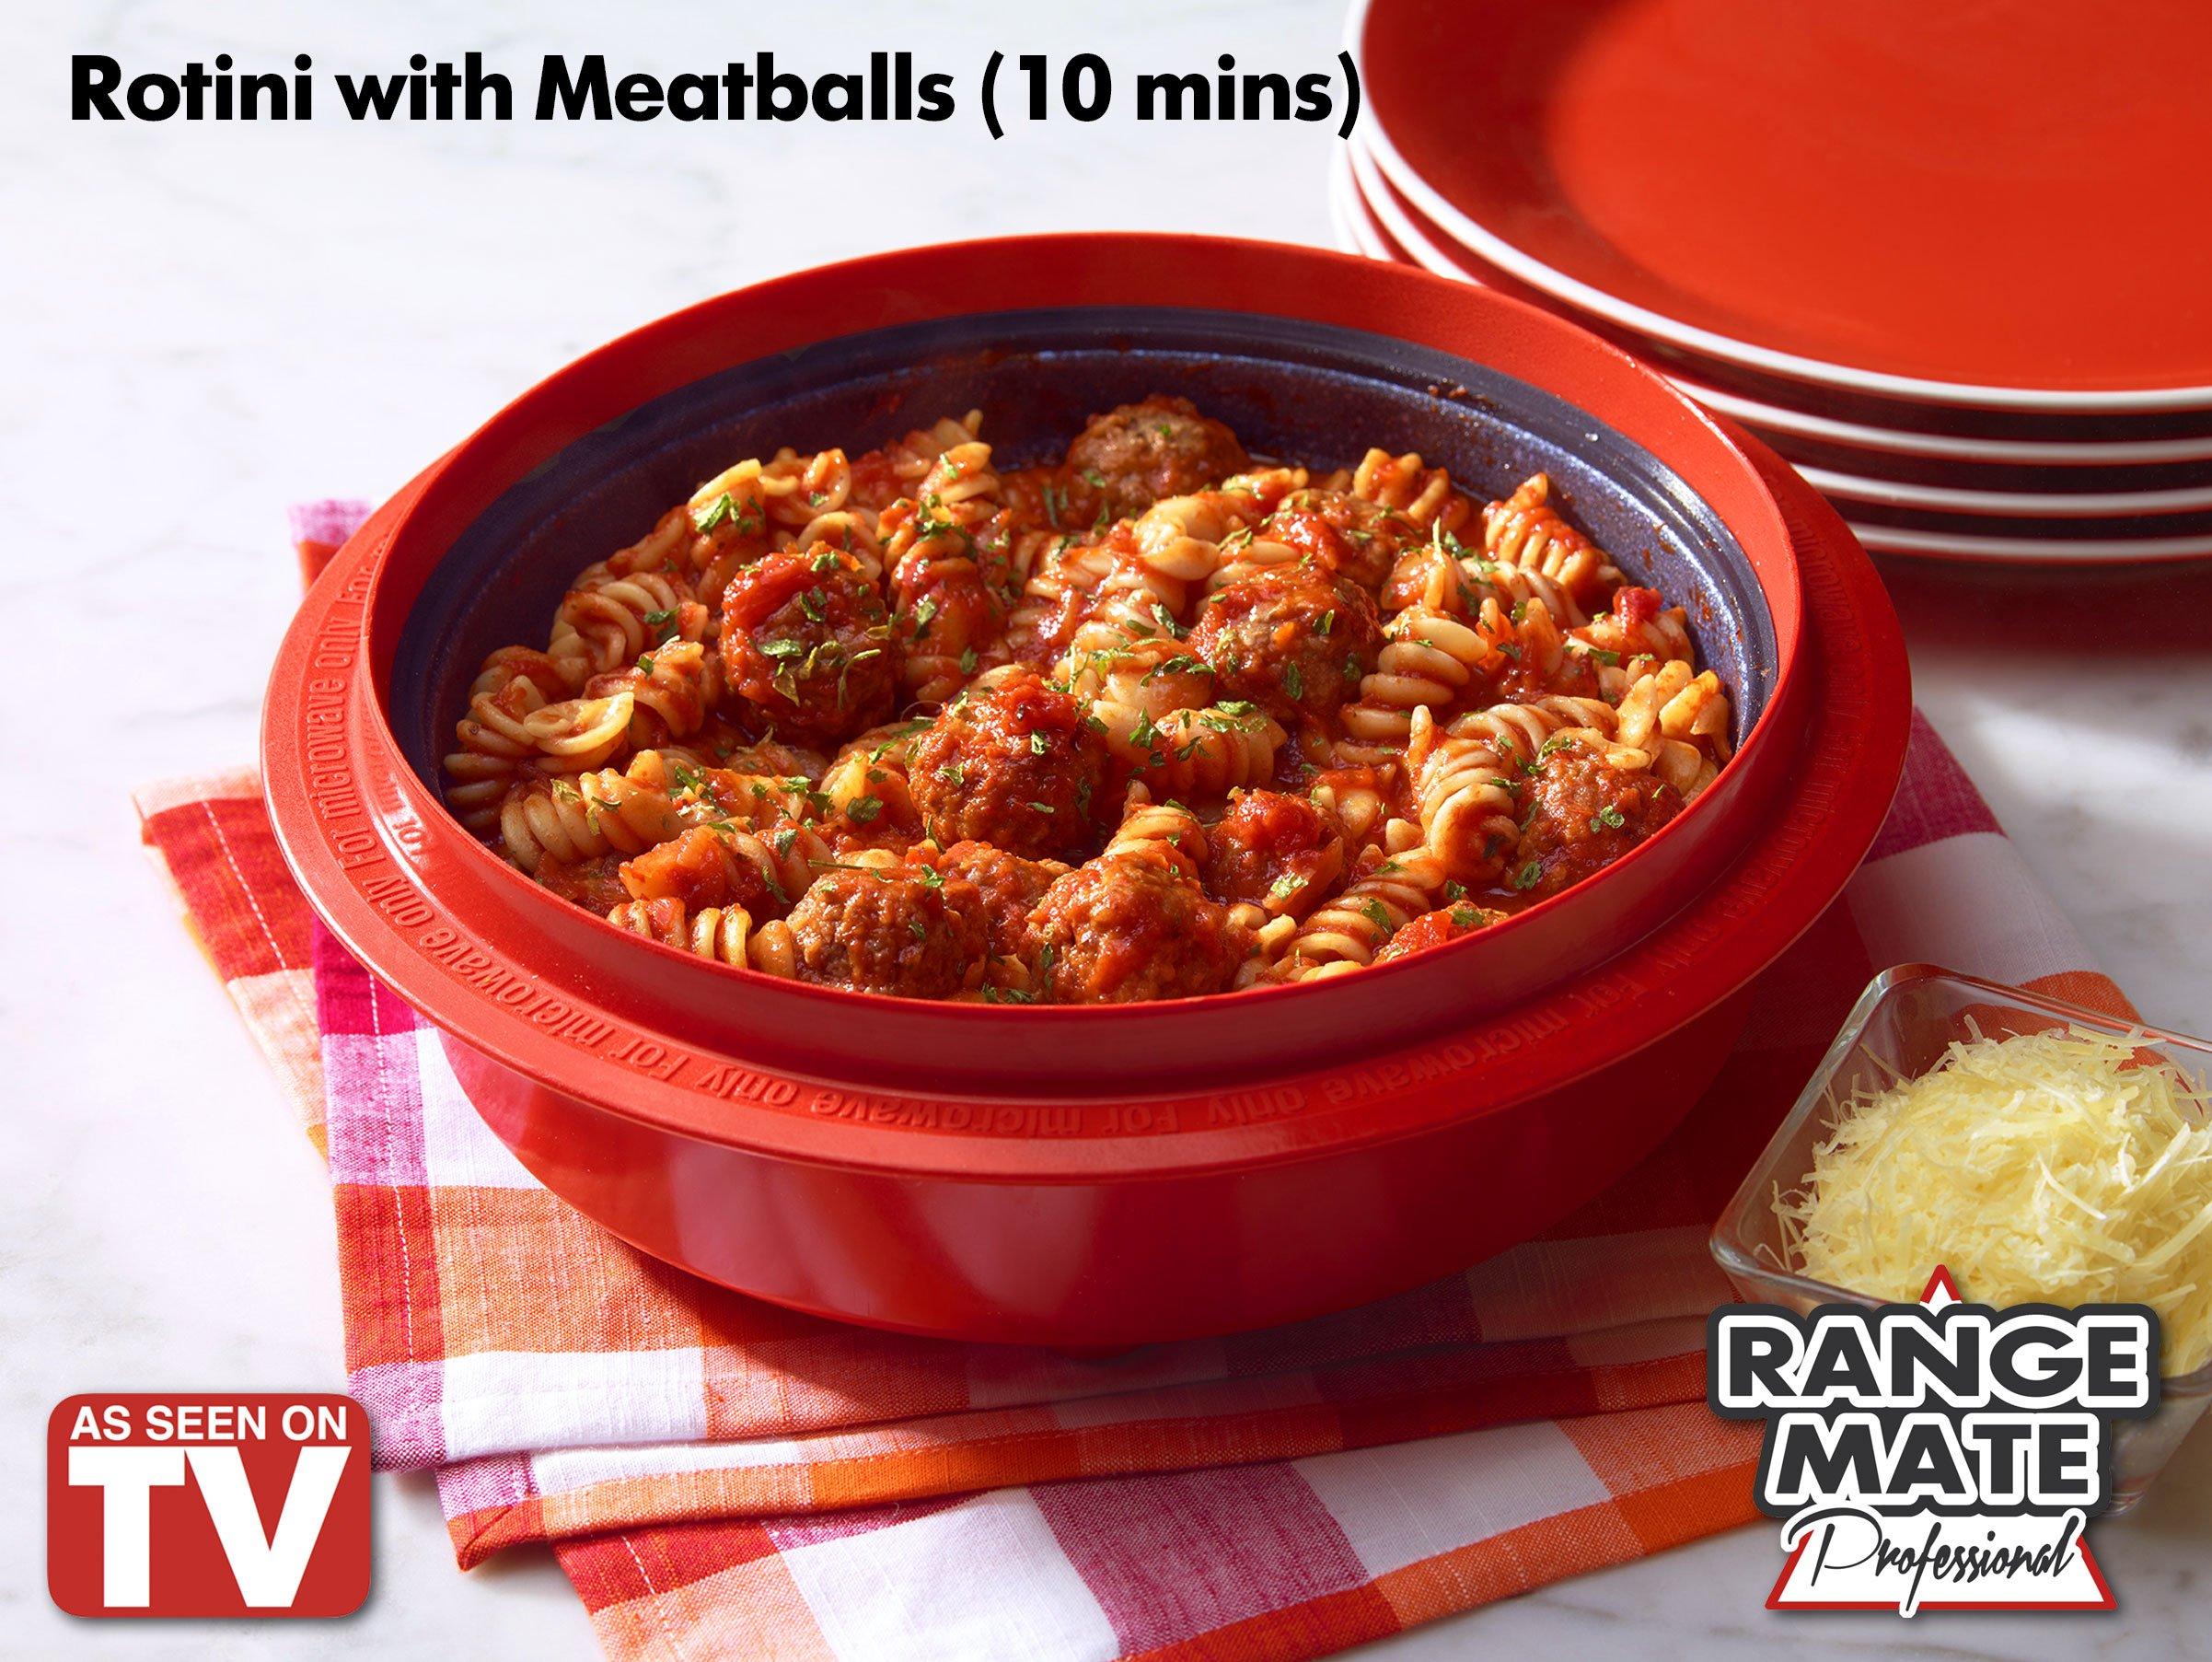 Range Mate Pro Deluxe Nonstick Microwave 7-Piece Grill Pot/Pan Cookware Starter Set ''As Seen On TV'' (Grill, Bake, Roast, Saute, Steam, Poach, & One Pot Meals)